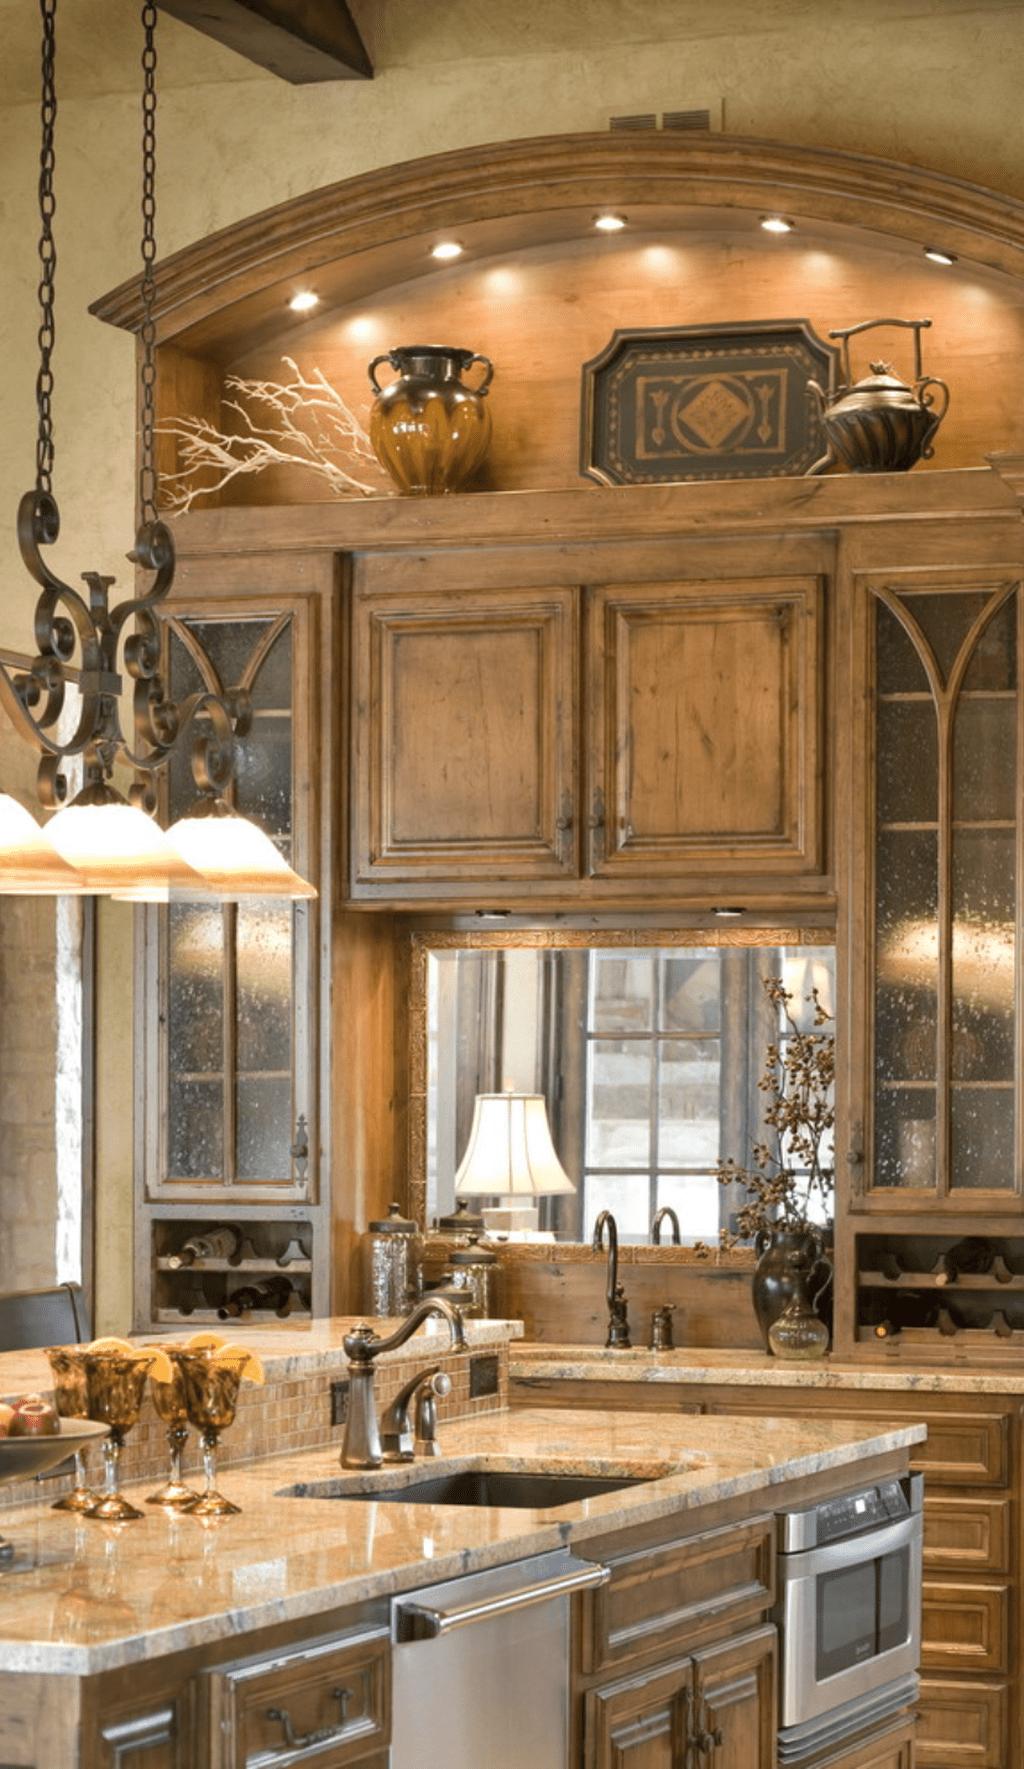 Fabulous Rustic Italian Decor Ideas For Your Home 16